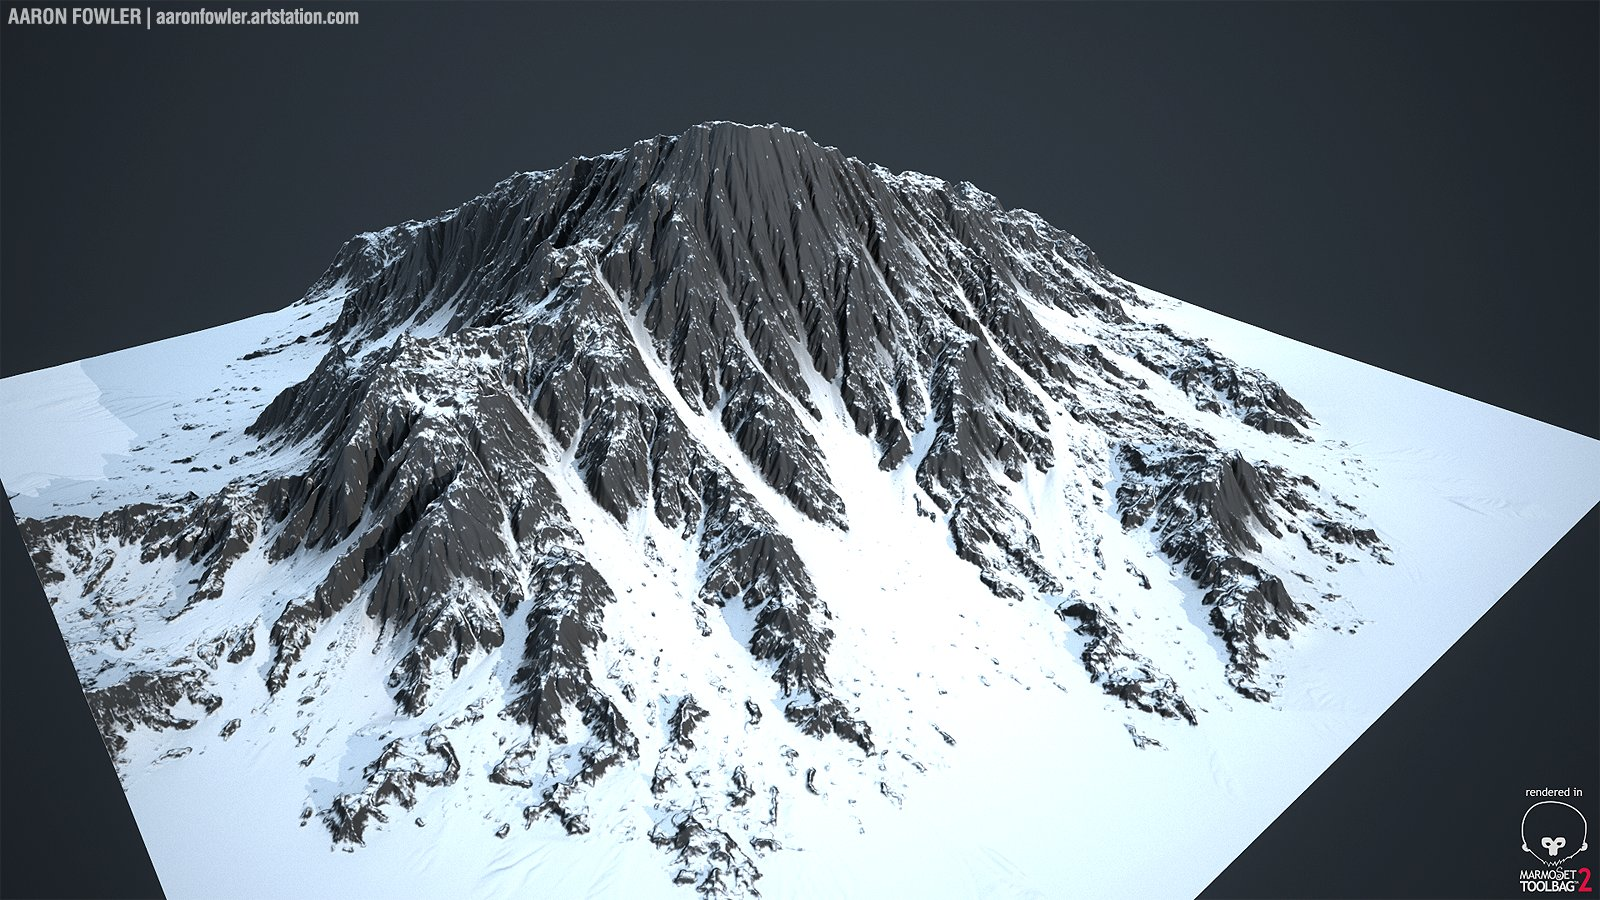 aaron-fowler-aaron-fowler-terrain02.jpg?1436539525